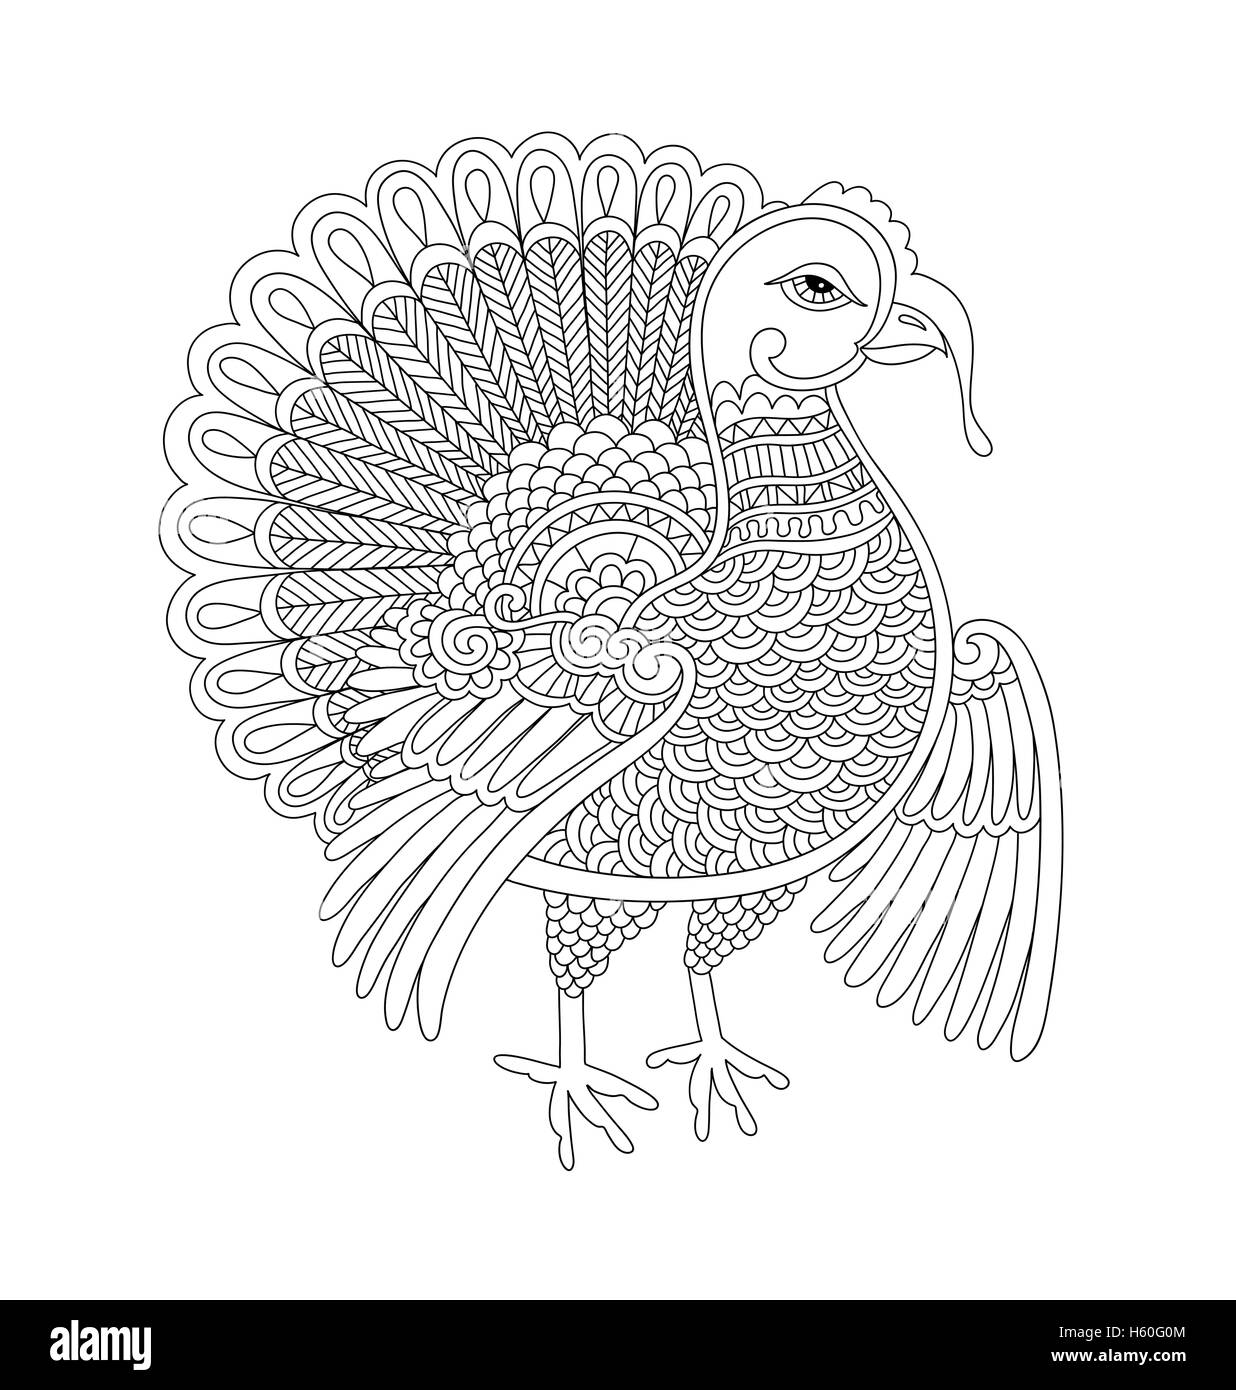 black and white line art turkey decoration for thanksgiving holi